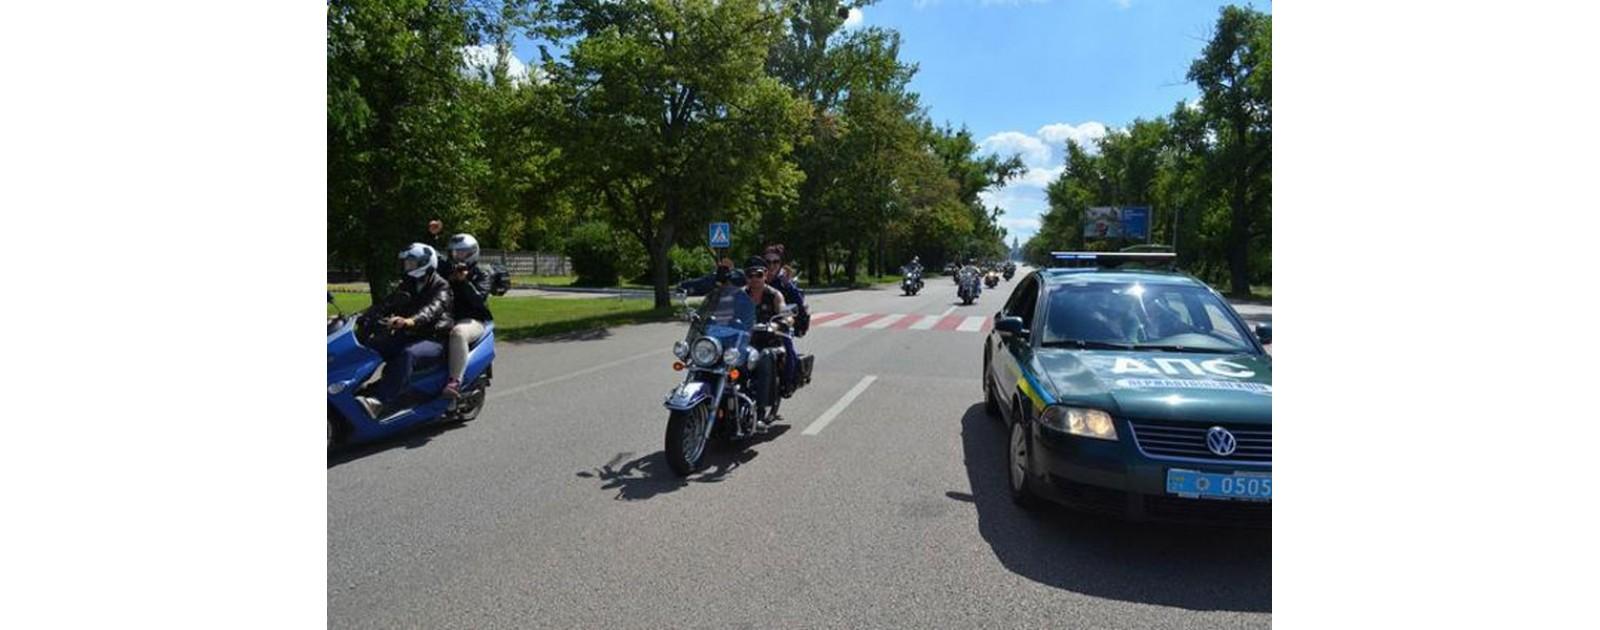 Запрет проезда по улицам на двухколесном транспорте